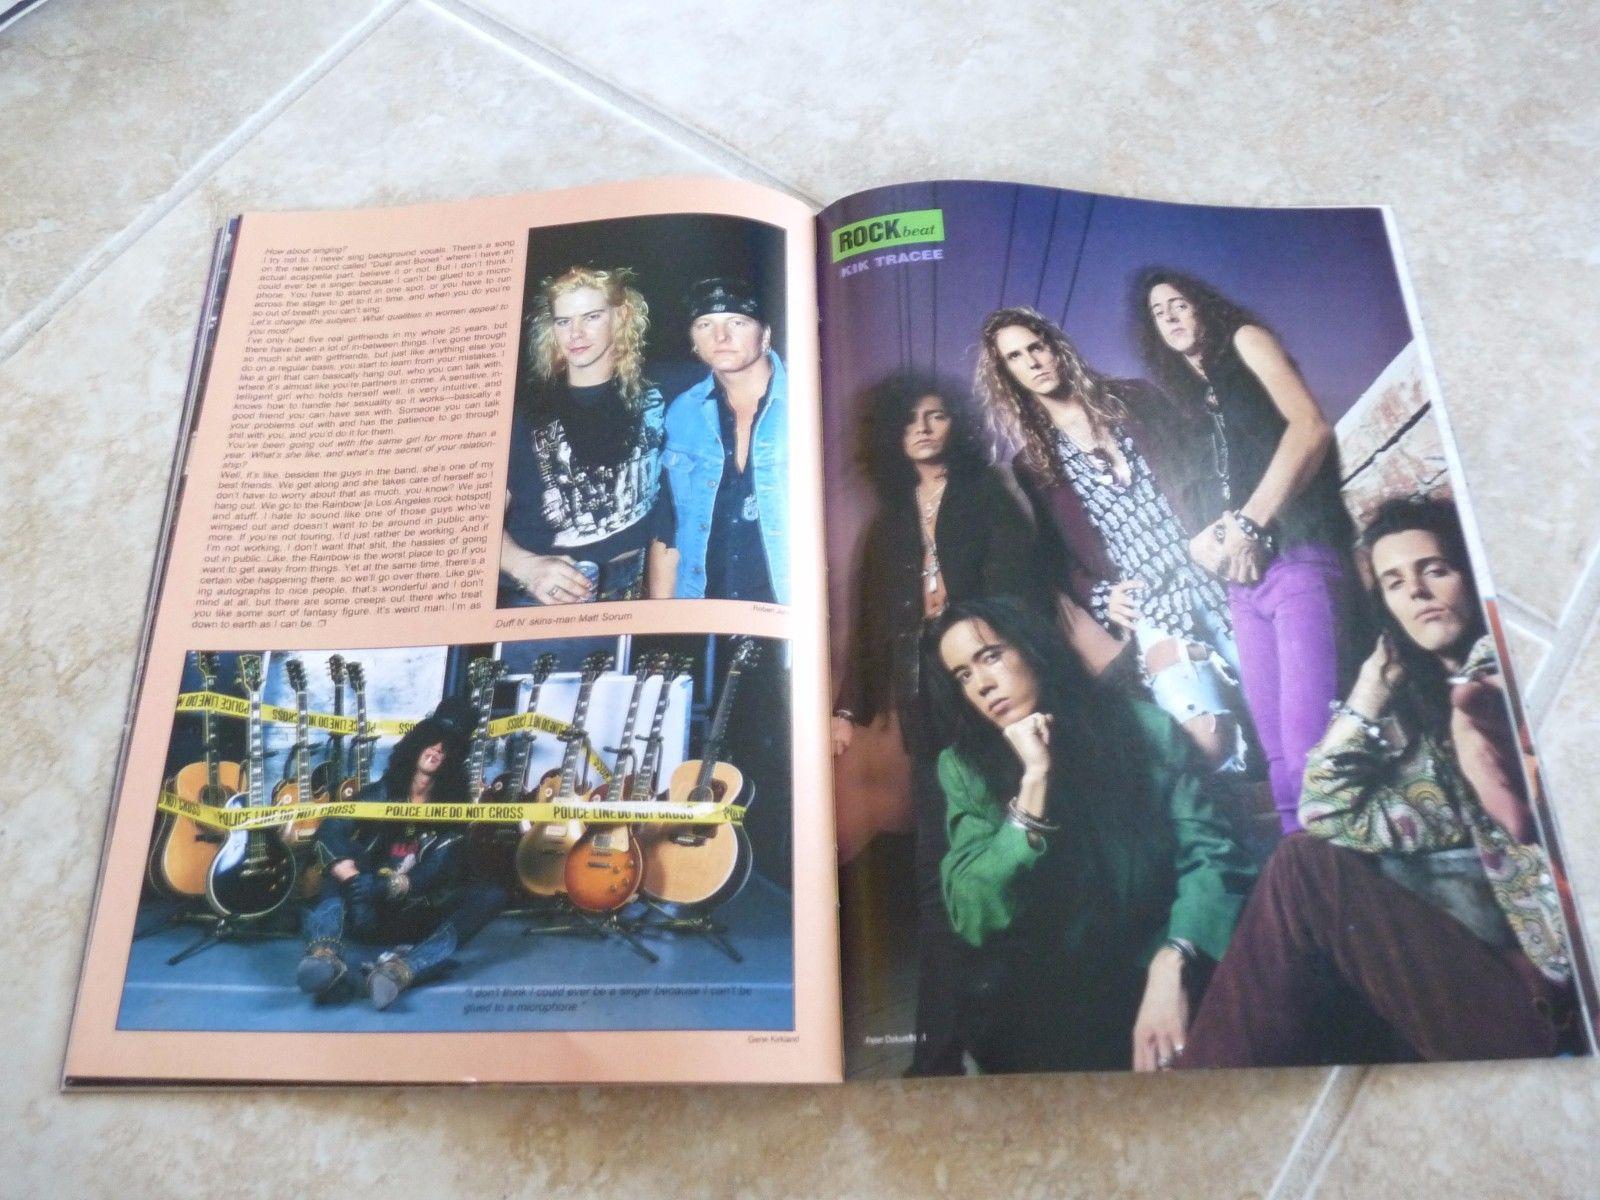 1991.07.DD - ROCKbeat Magazine - Guns N' Roses: The Grand Illusion (Slash) FLs7zi7H_o